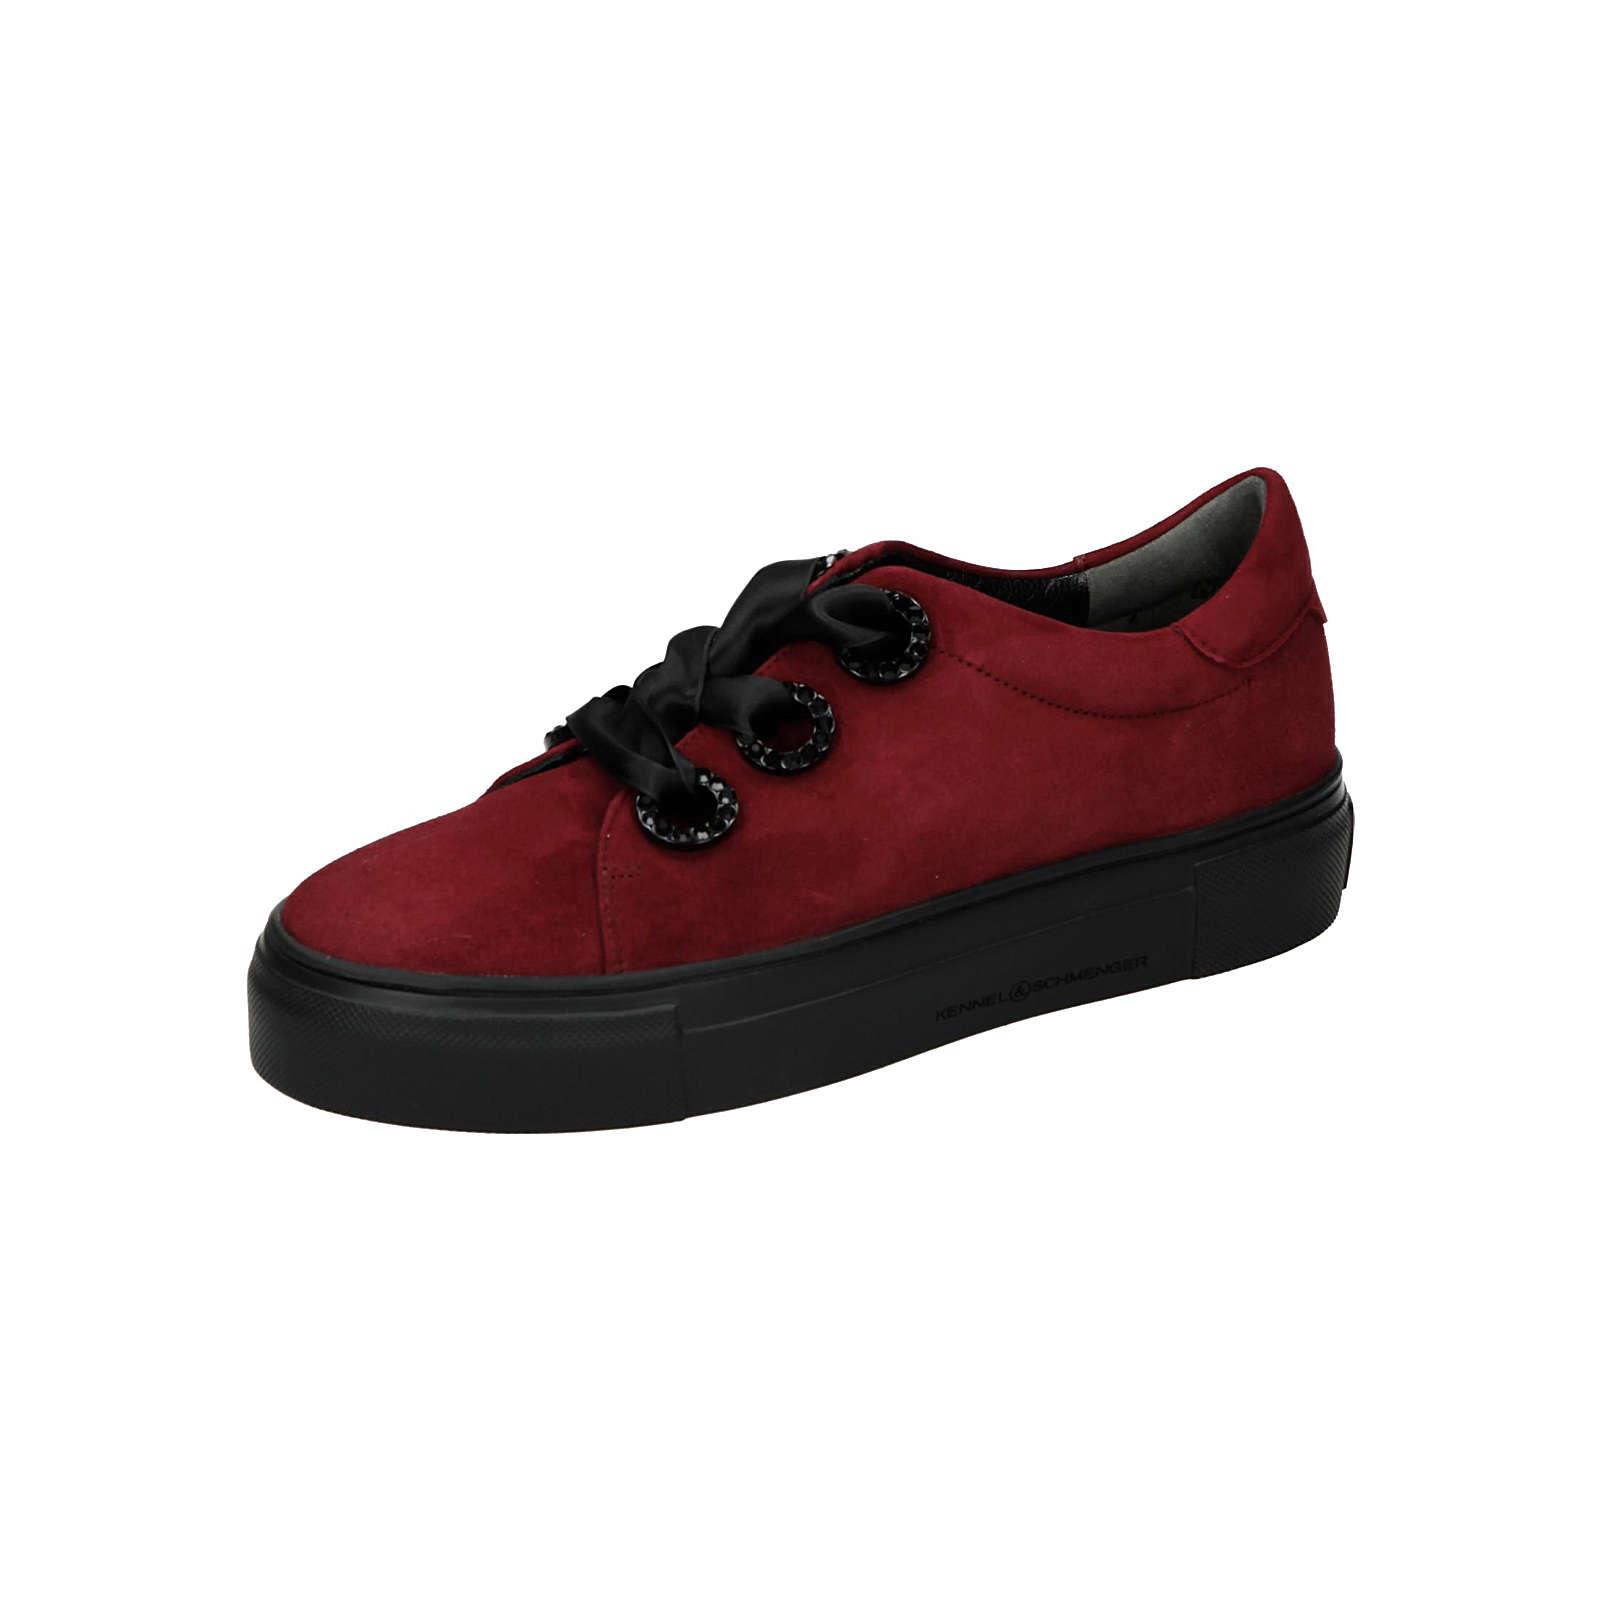 Kennel & Schmenger Sneaker Komfort-Halbschuhe rot Damen Gr. 41,5